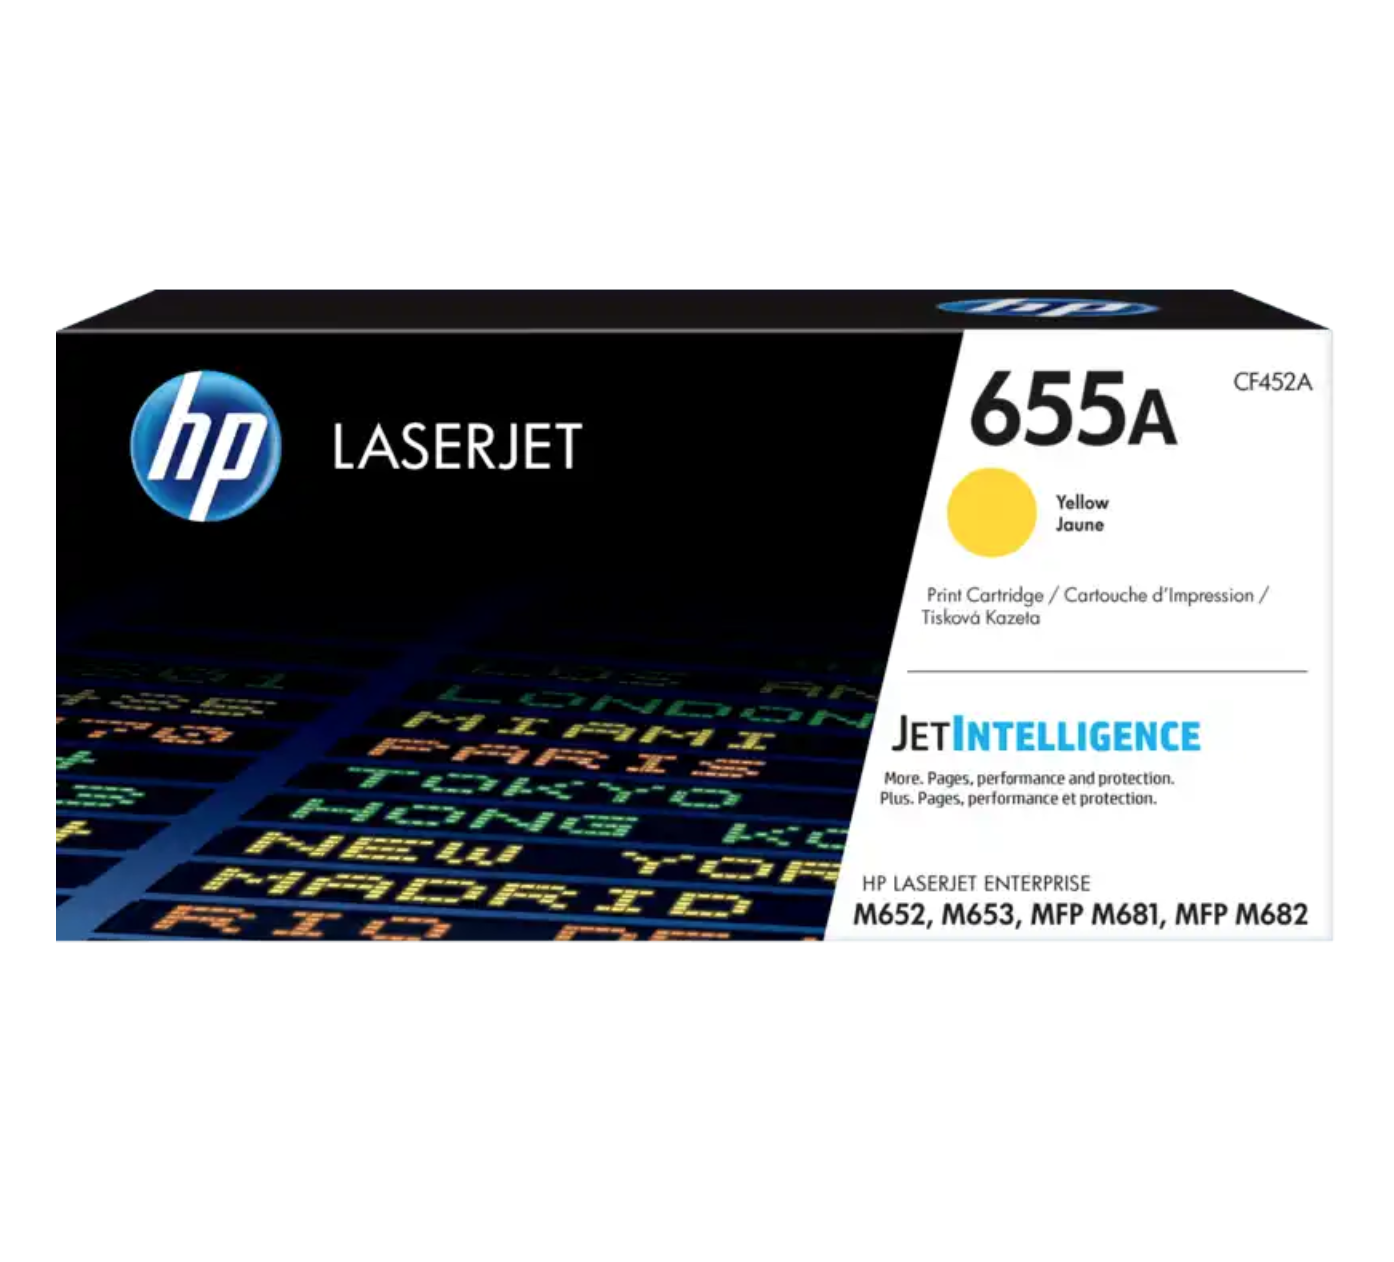 HP 655A 黃色原廠 LaserJet 碳粉 CF452A